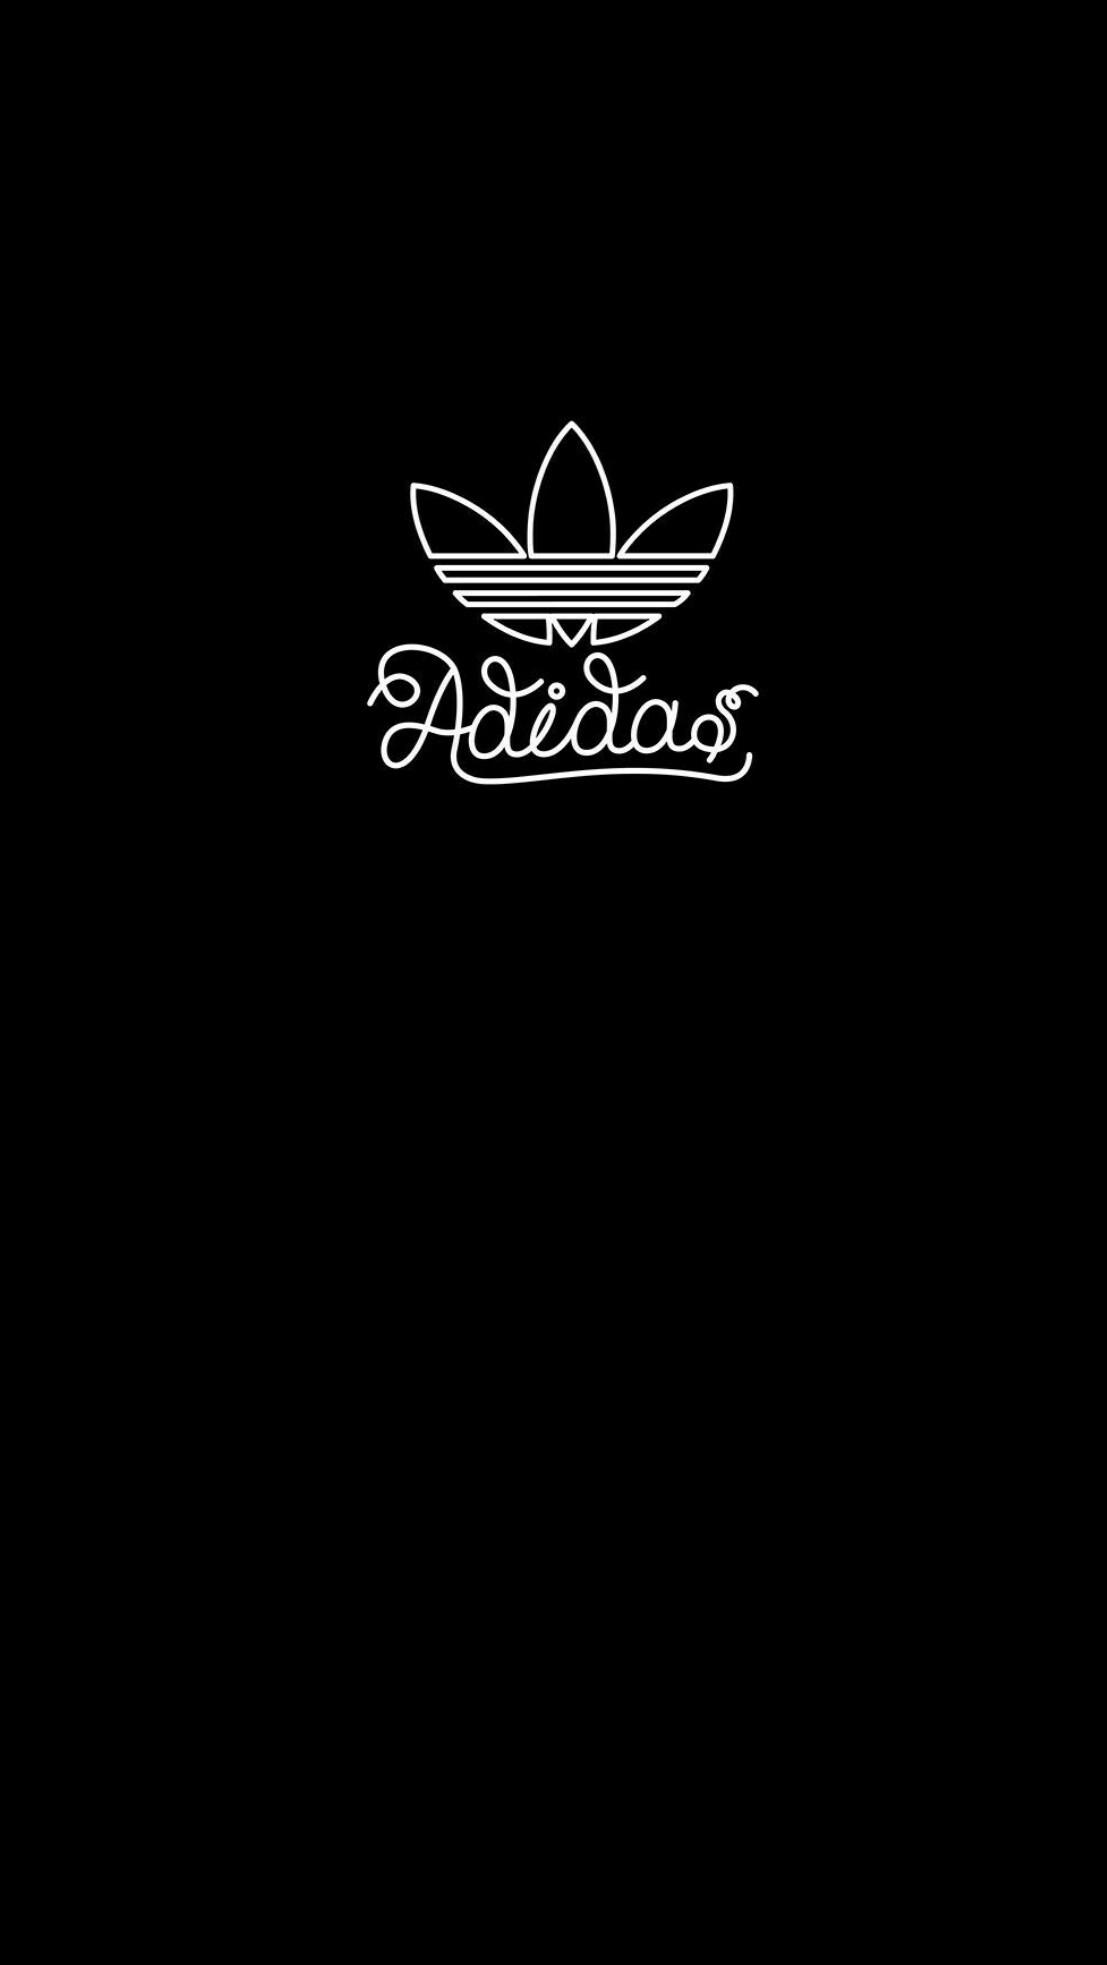 adidas wallpaper iphone 4